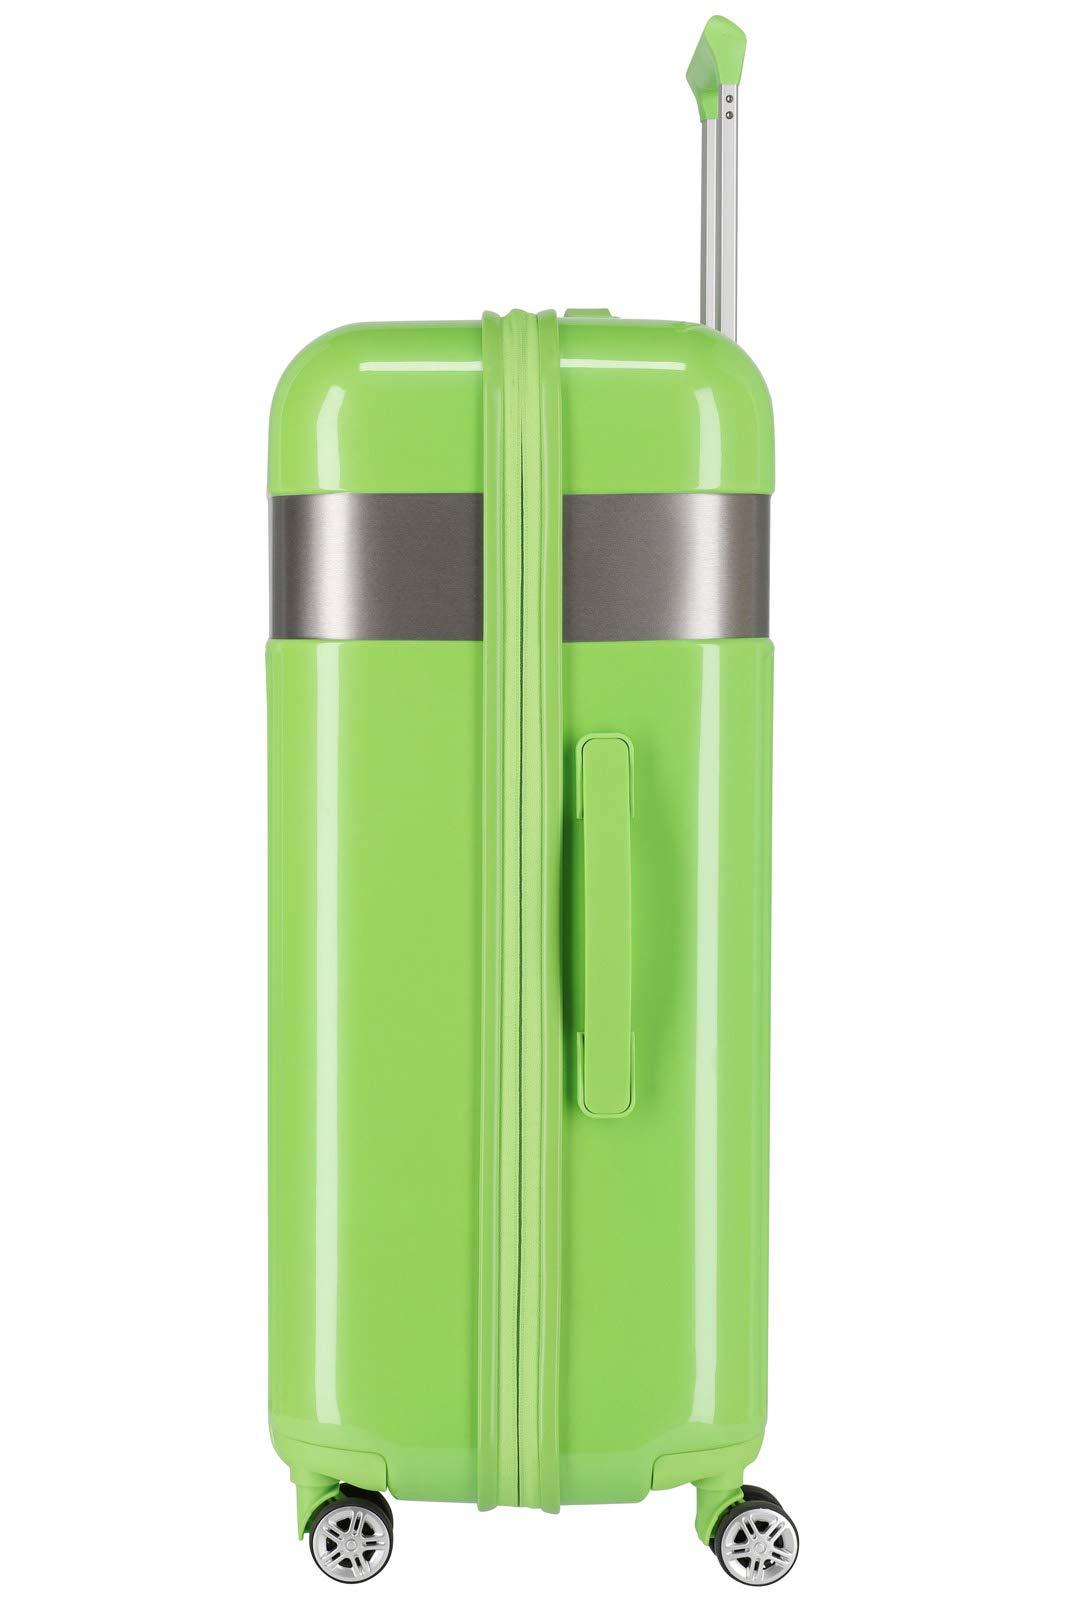 TITAN-Gepckserie-Spotlight-Flash-Edle-TITAN-Trolleys-und-Beautycases-in-knallbunten-Trendfarben-Koffer-Set-76-cm-208-Liter-Flashy-Kiwi